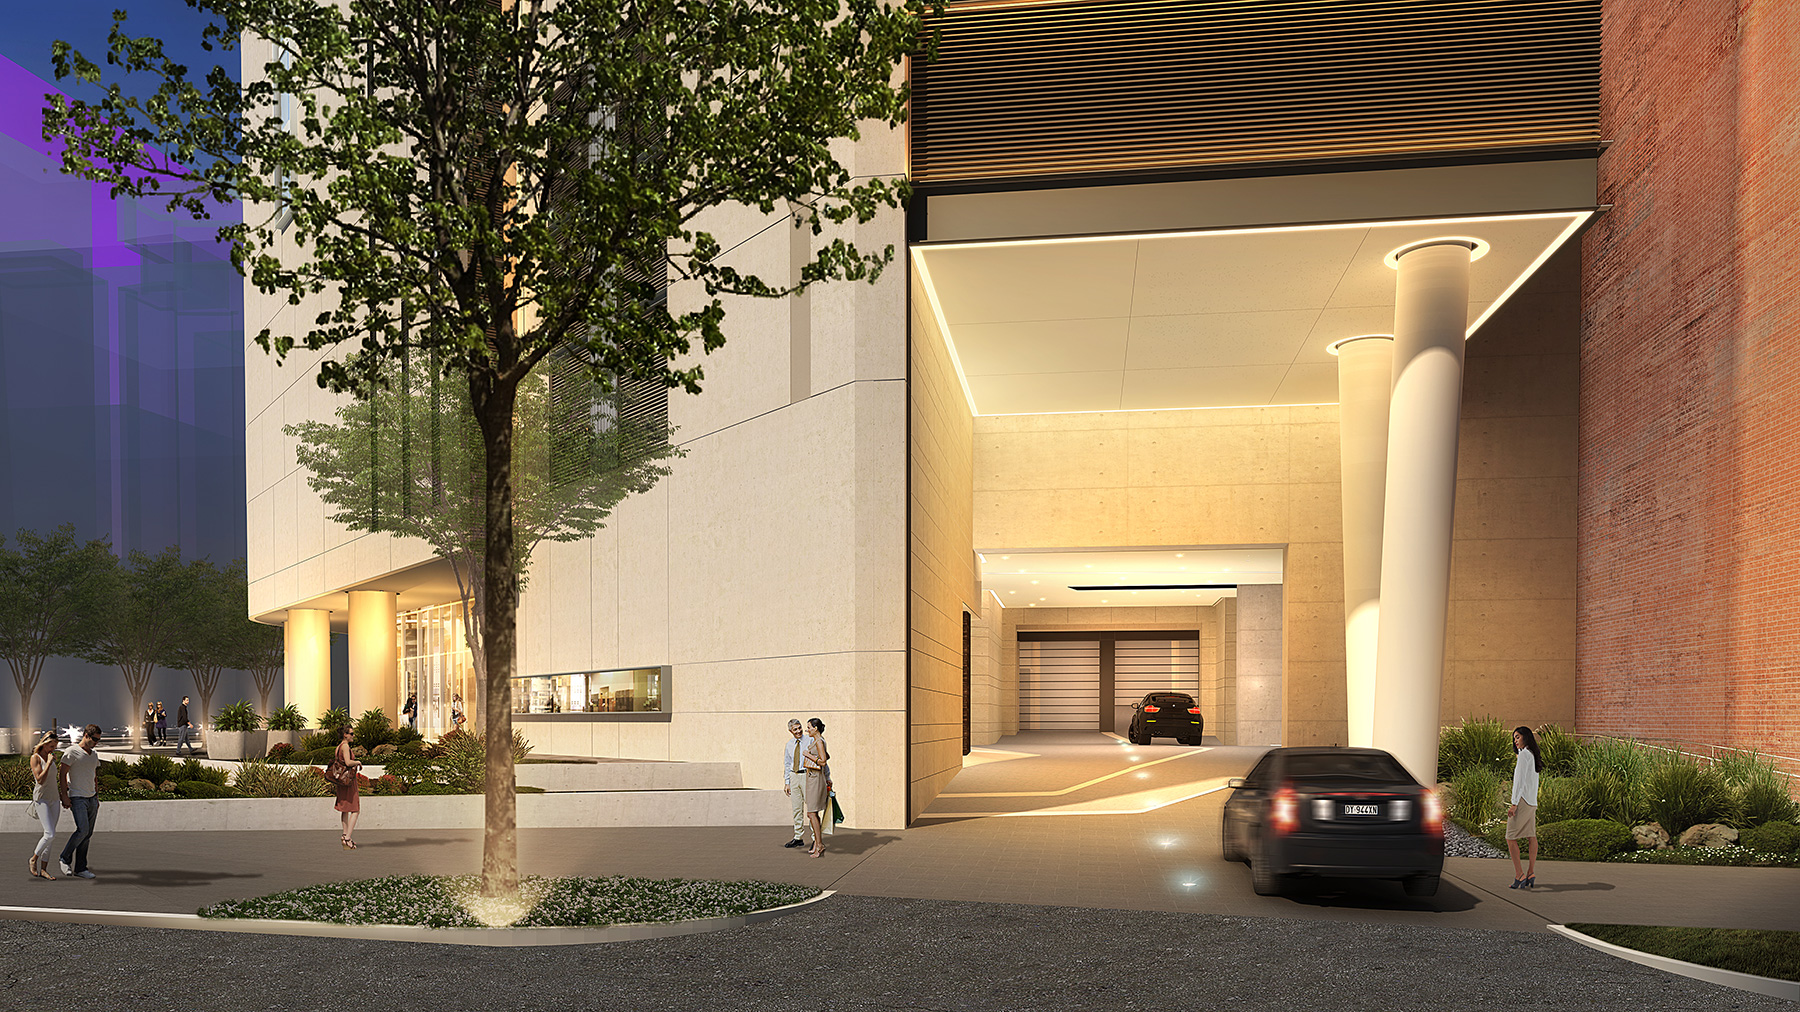 04-Block-42-4-Motor-Court-Architect-Hous